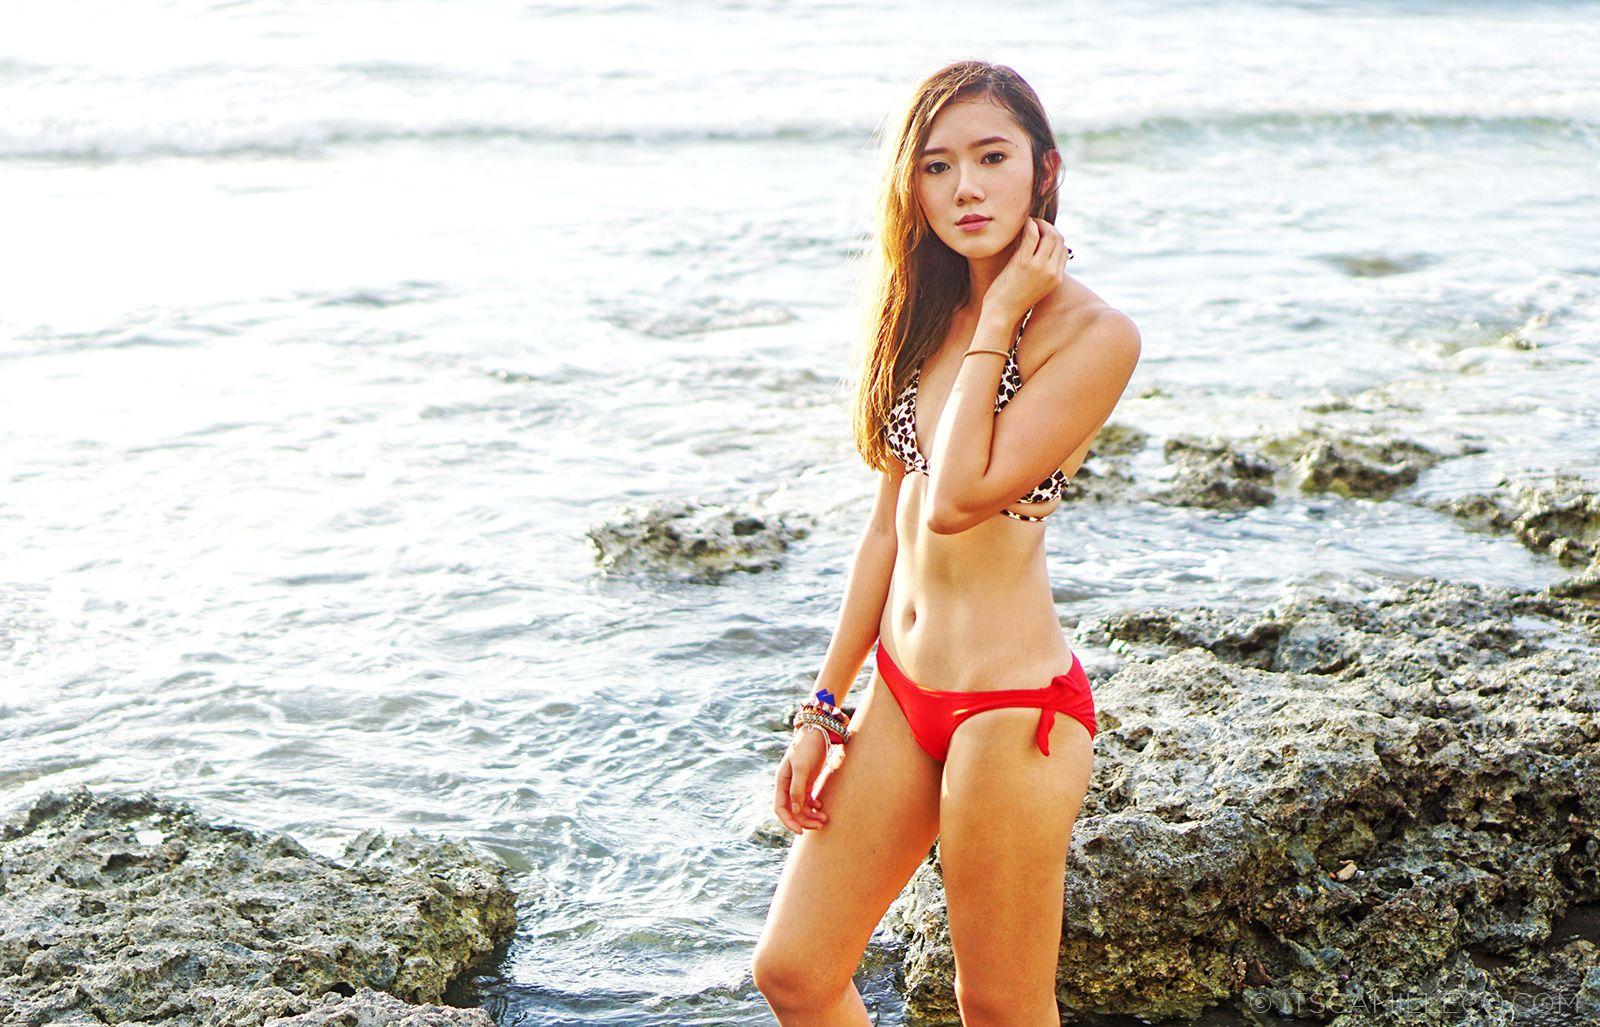 DVF Loves Roxy Bikini At Soul Surf | www.itscamilleco.com